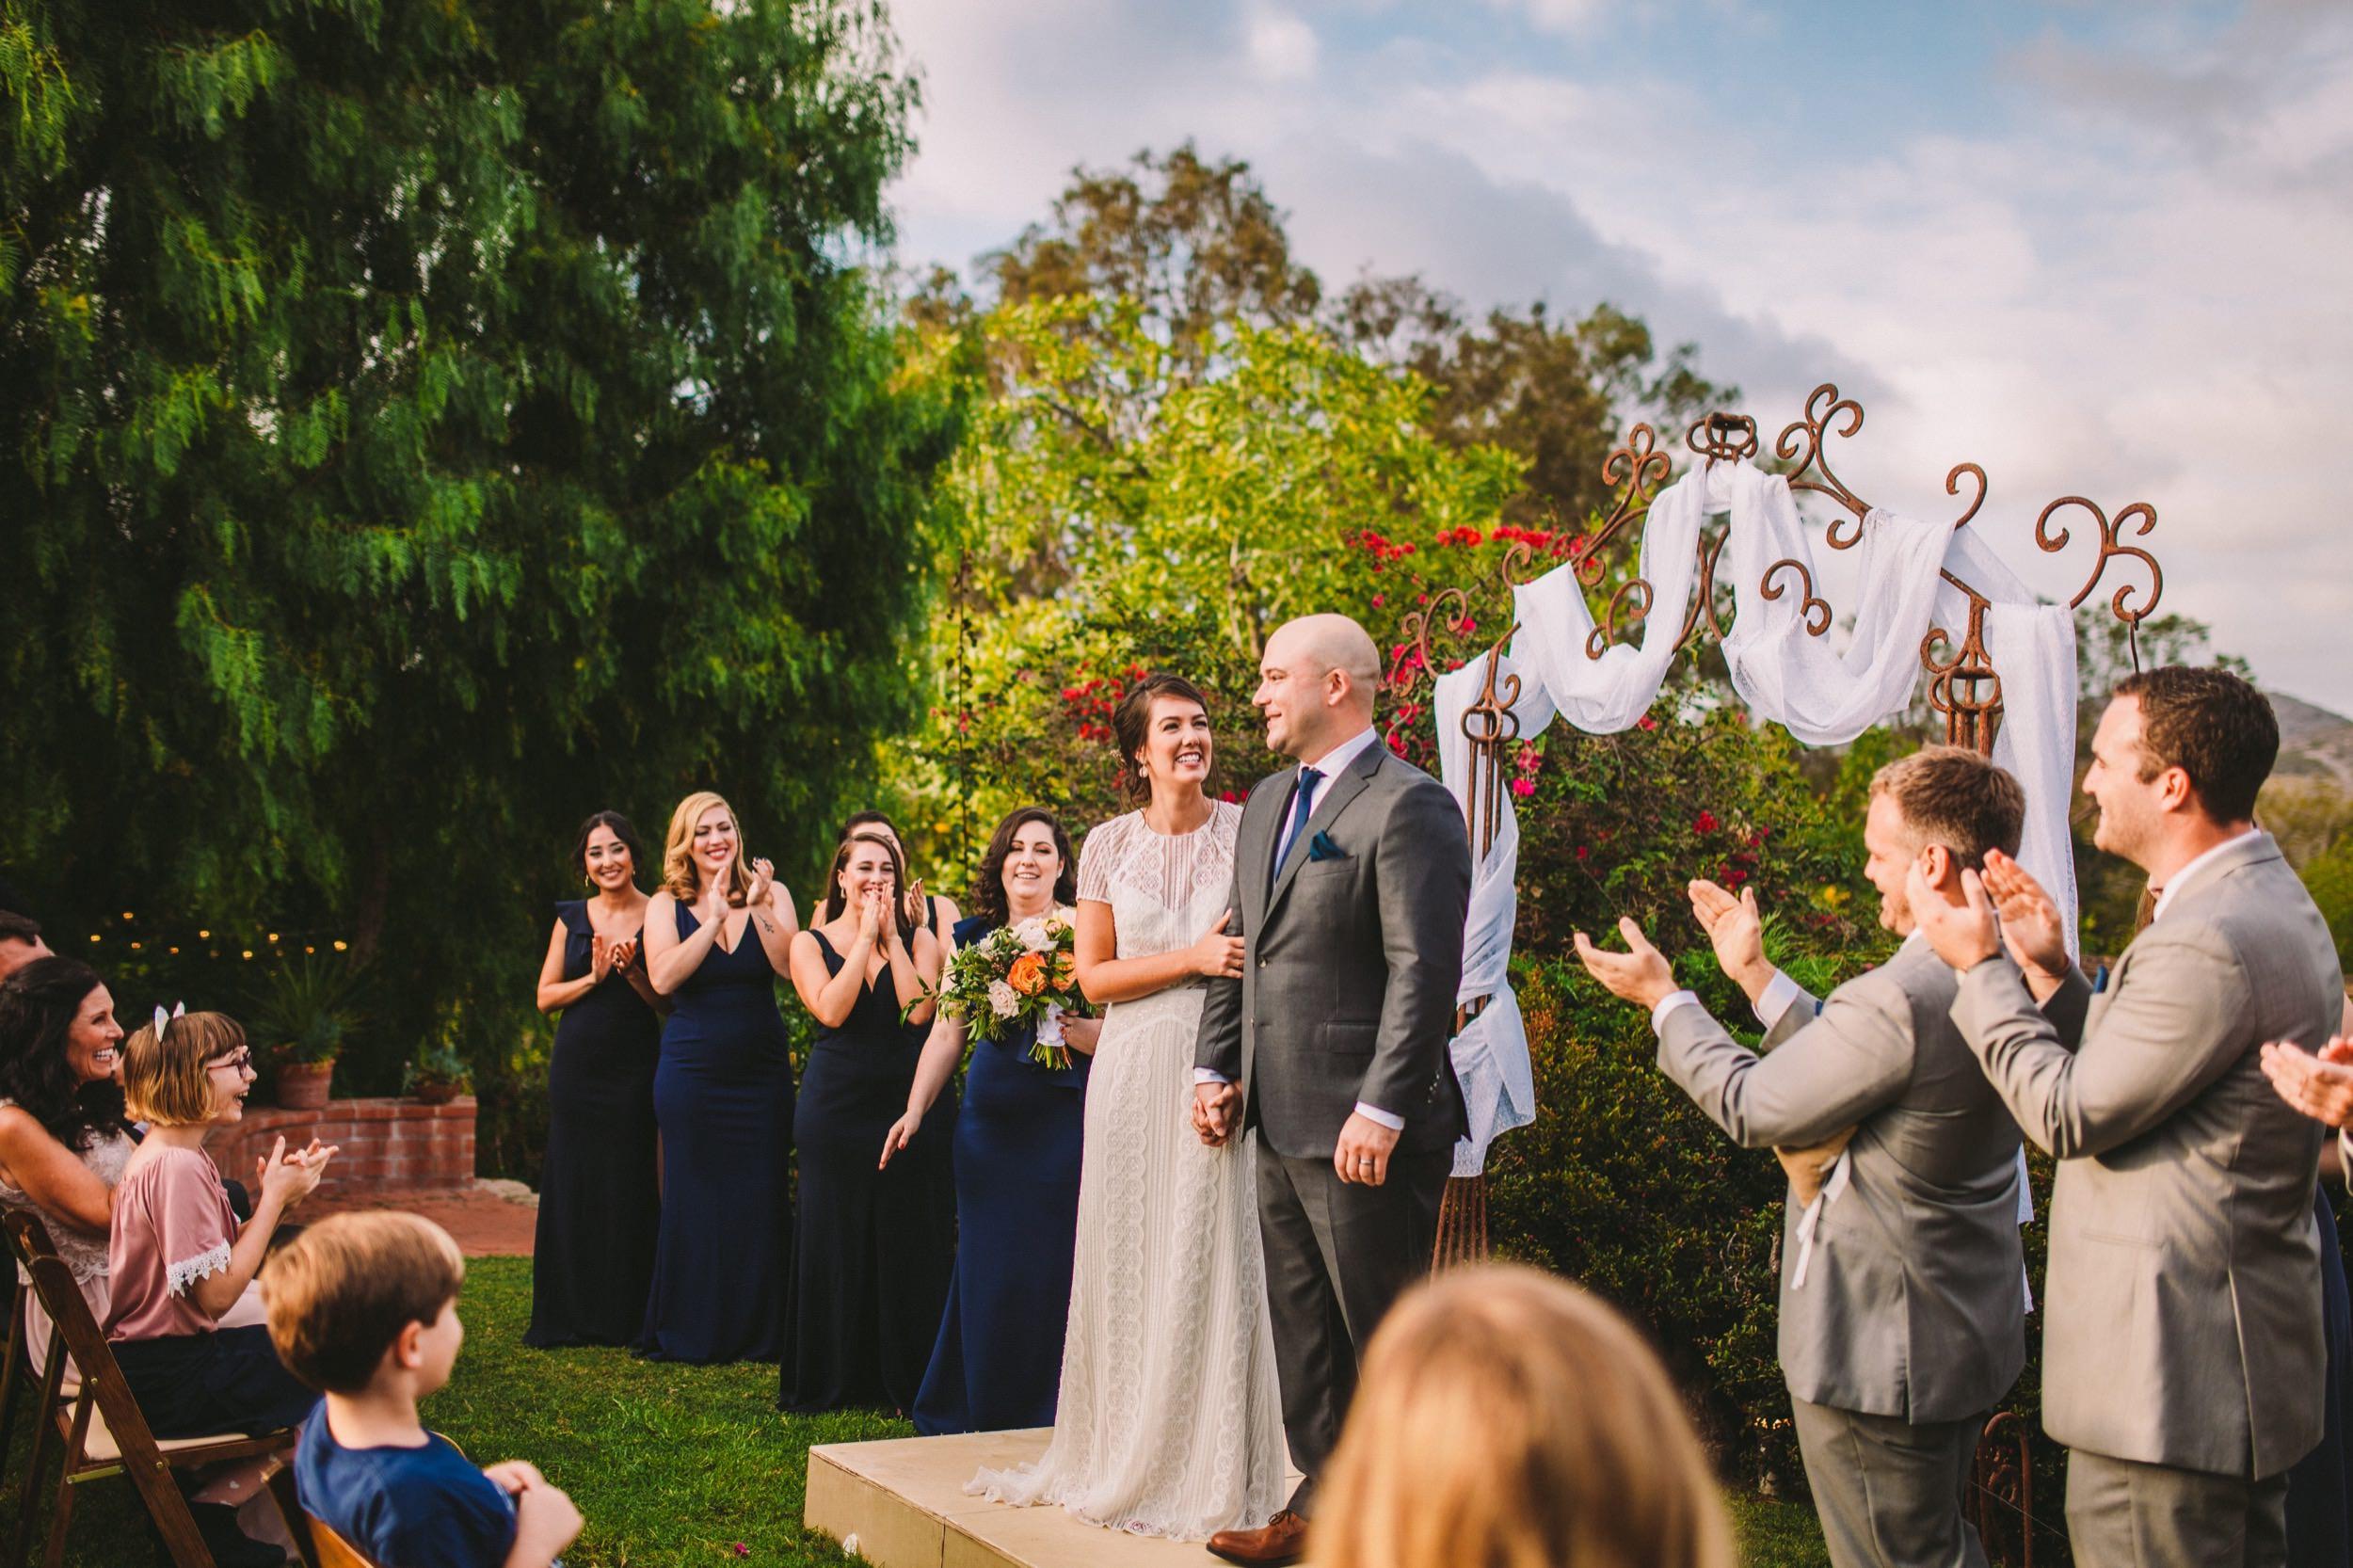 Vibrant & Joyful Wedding Ceremony Photography in Carlsbad